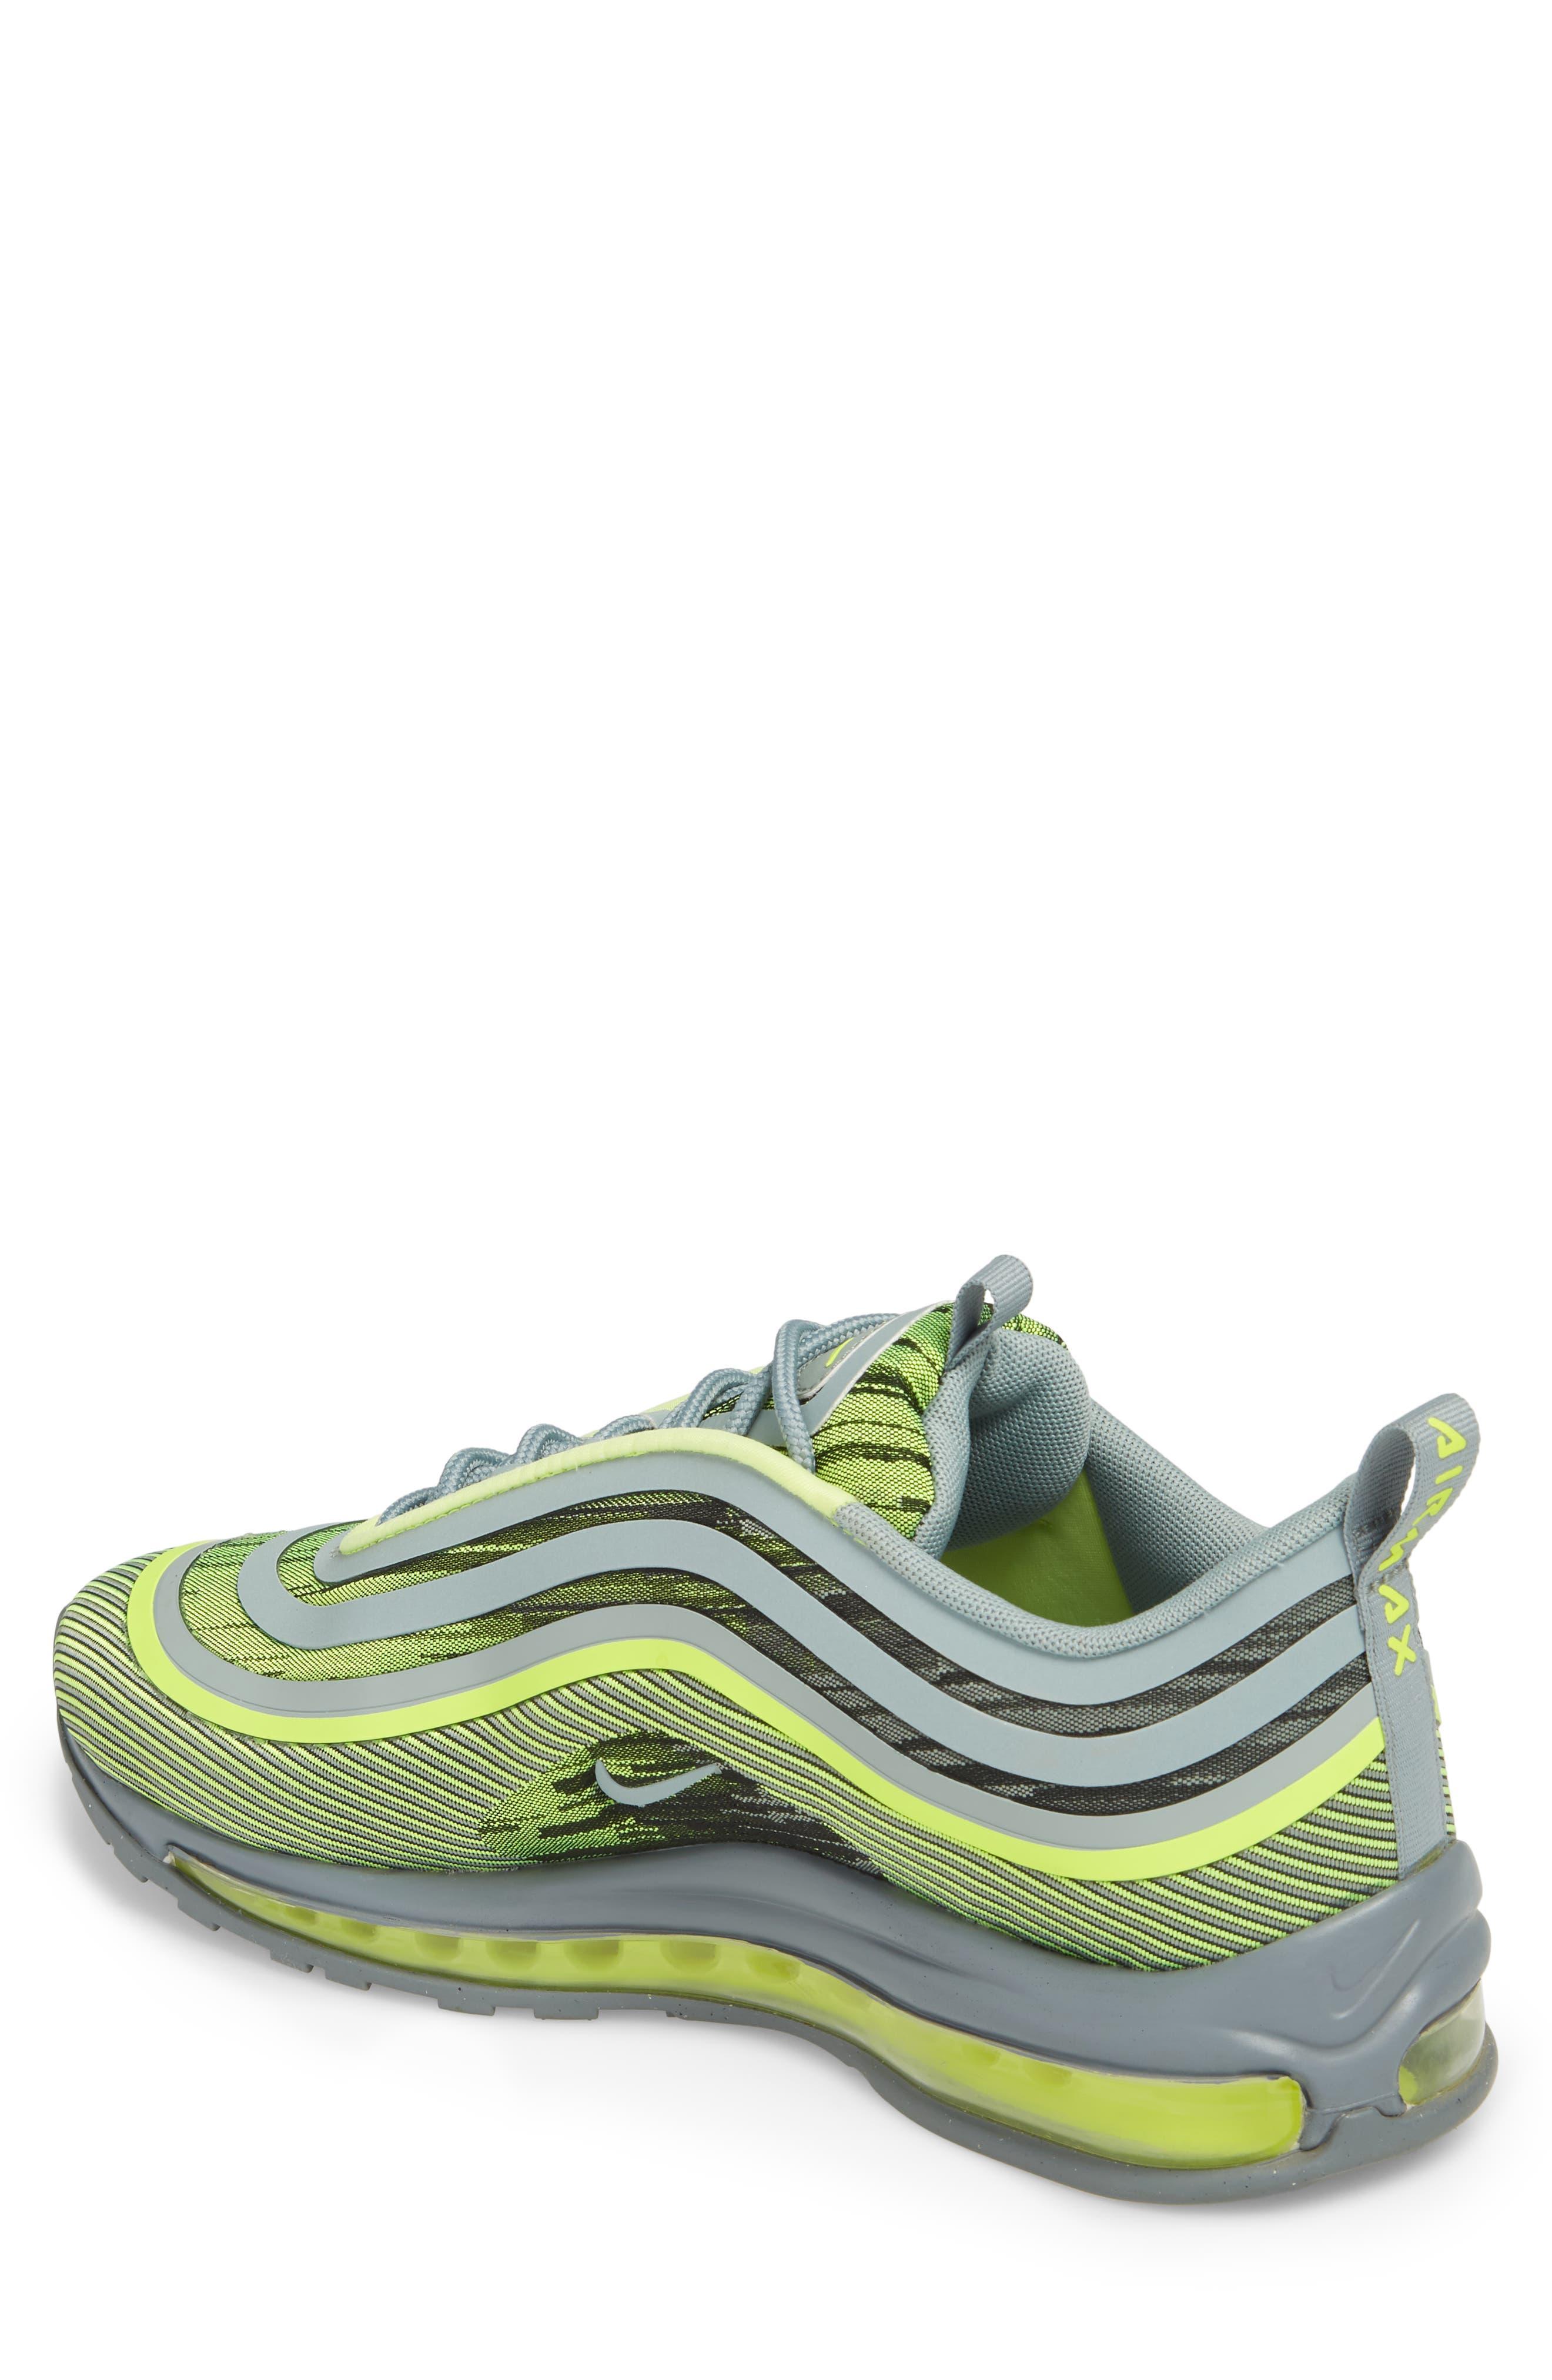 Air Max 97 Ultra '17 Sneaker,                             Alternate thumbnail 2, color,                             Volt/ Mica Green/ Cool Grey